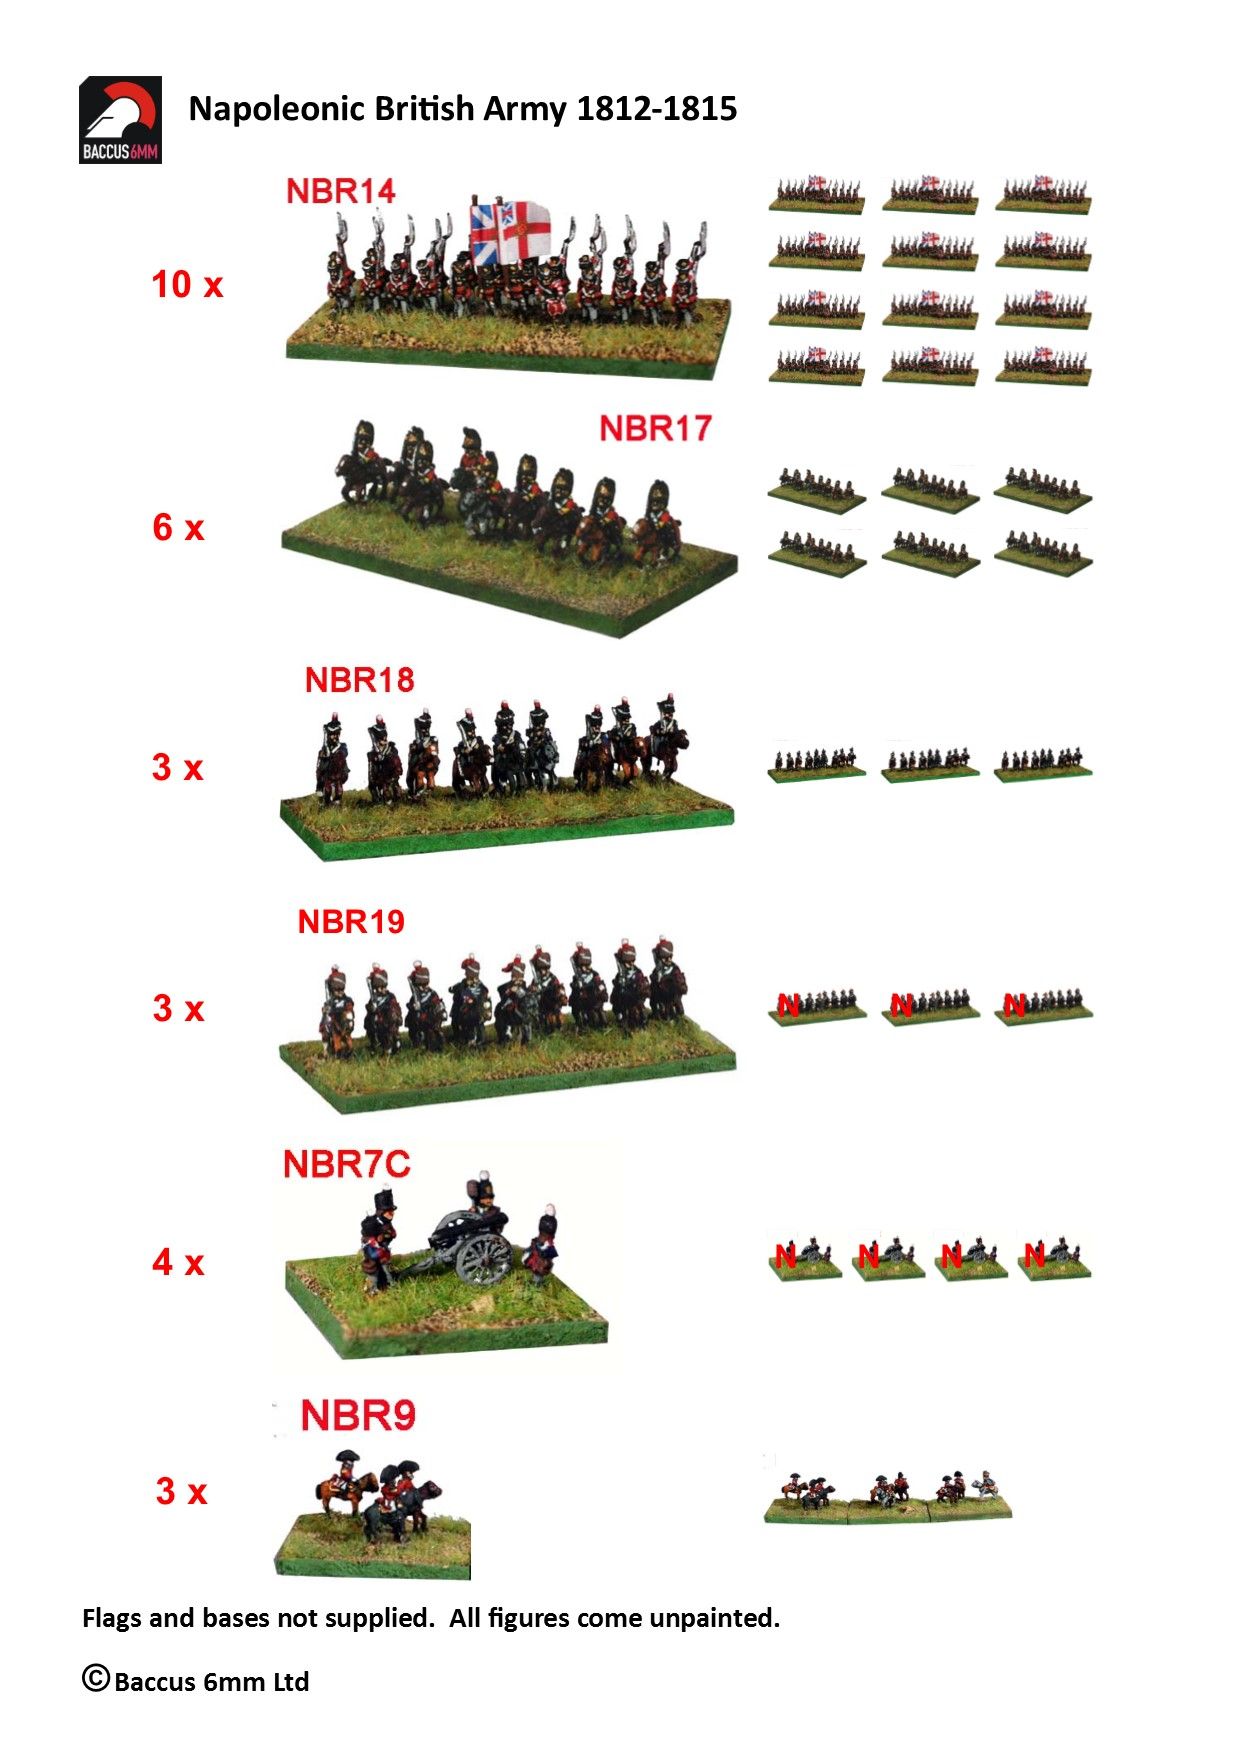 Napoleonic - Napoleonic British Army Pack 1812-1815